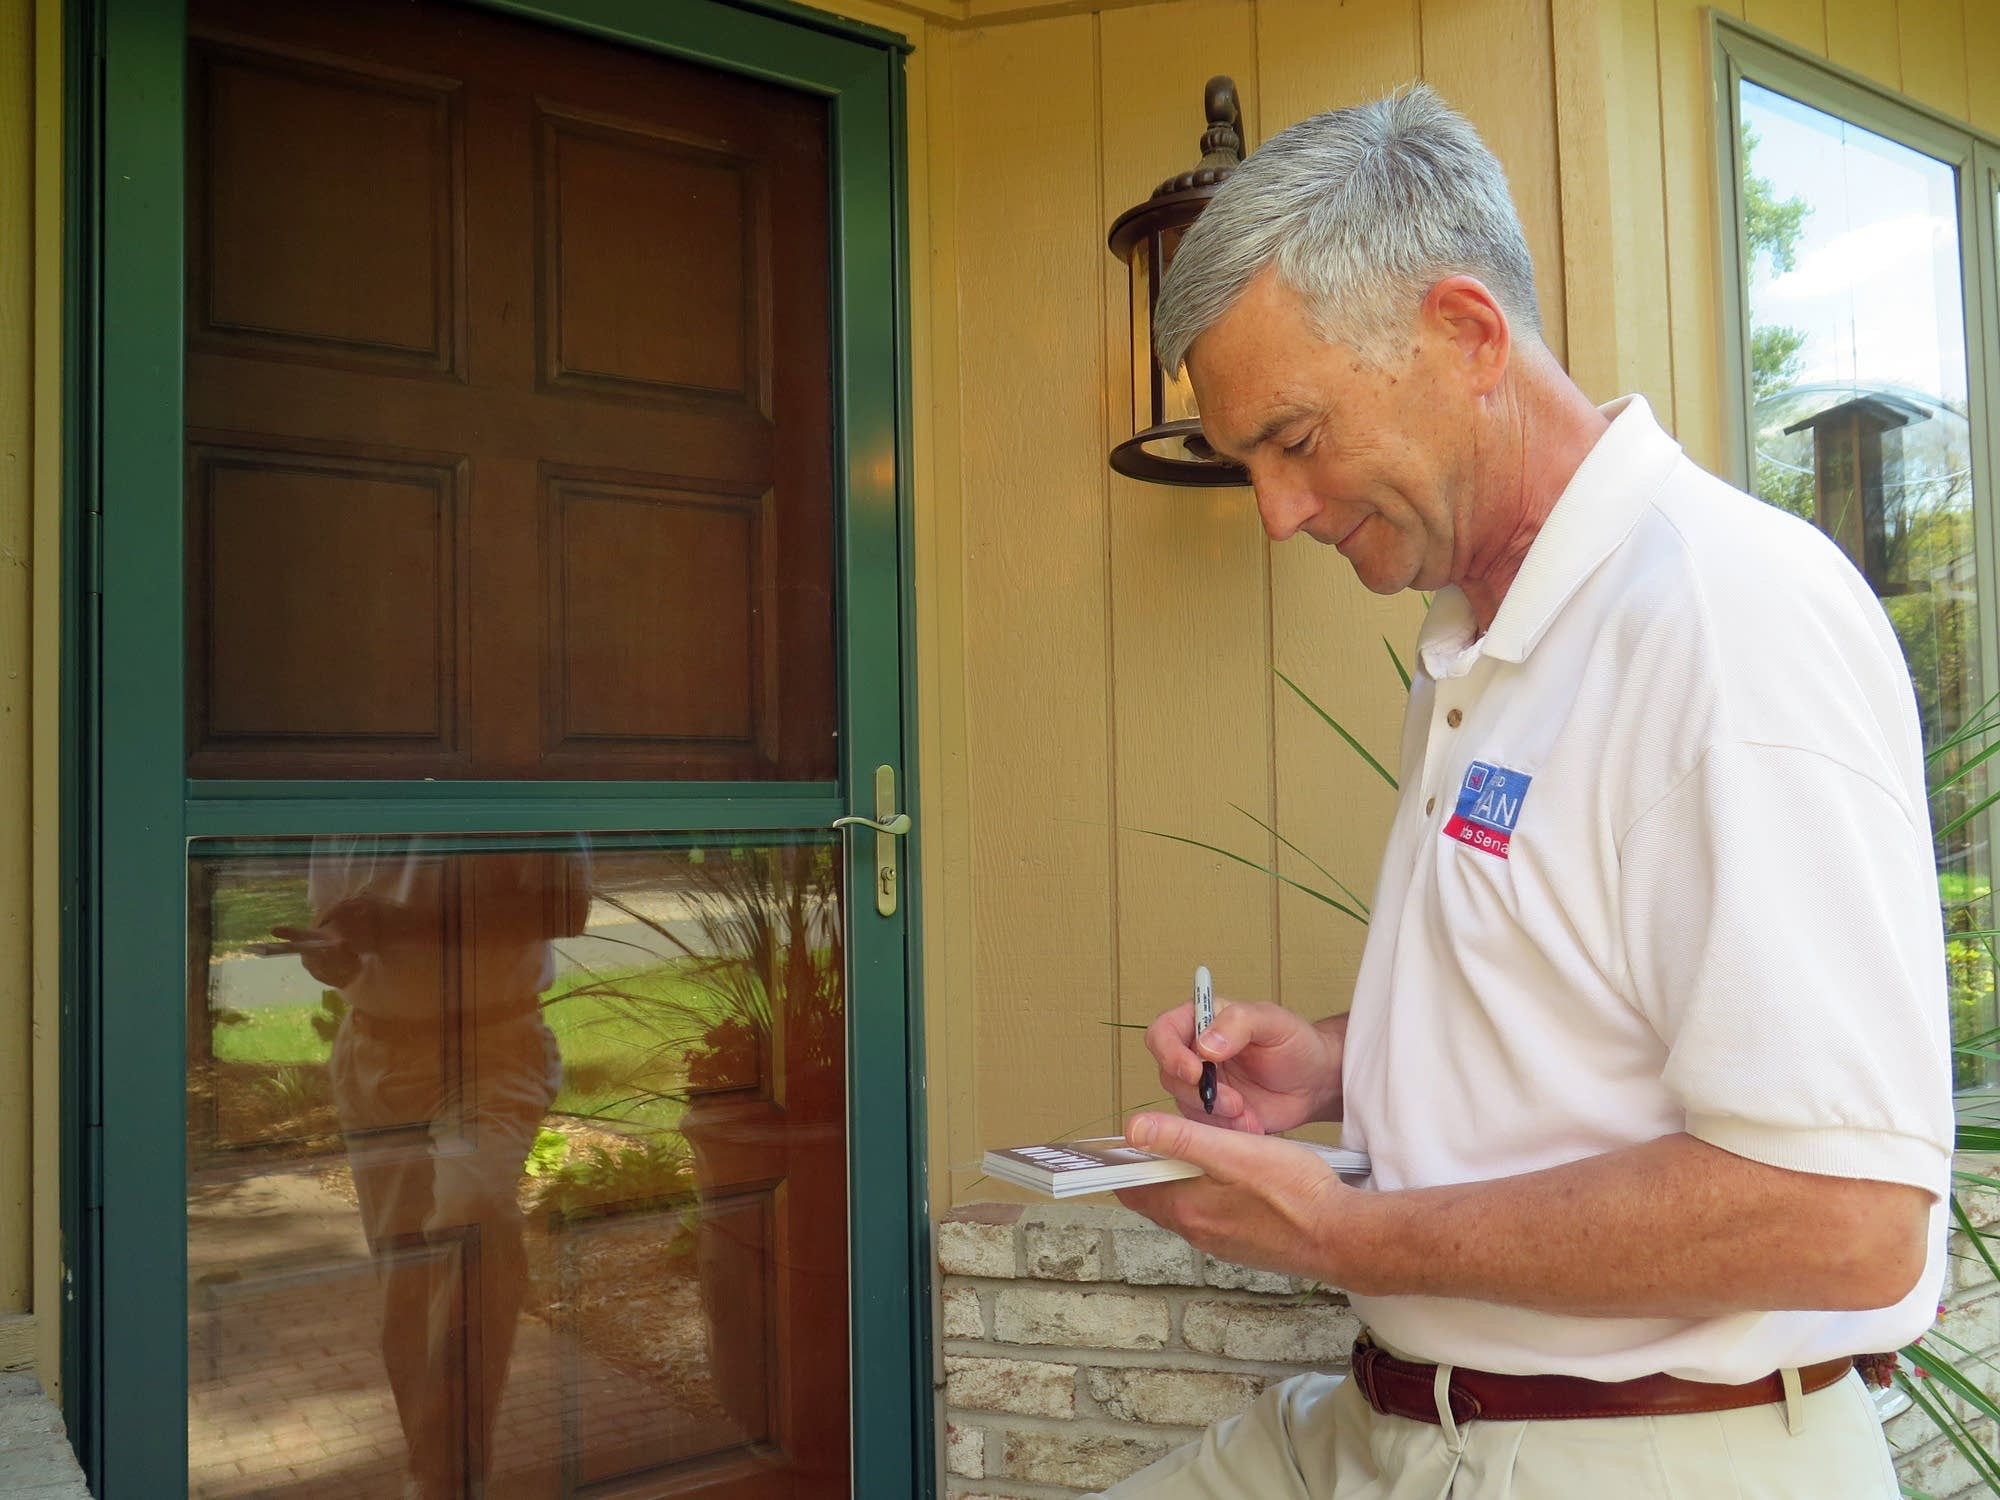 Republican state Sen. David Hann writes a note.